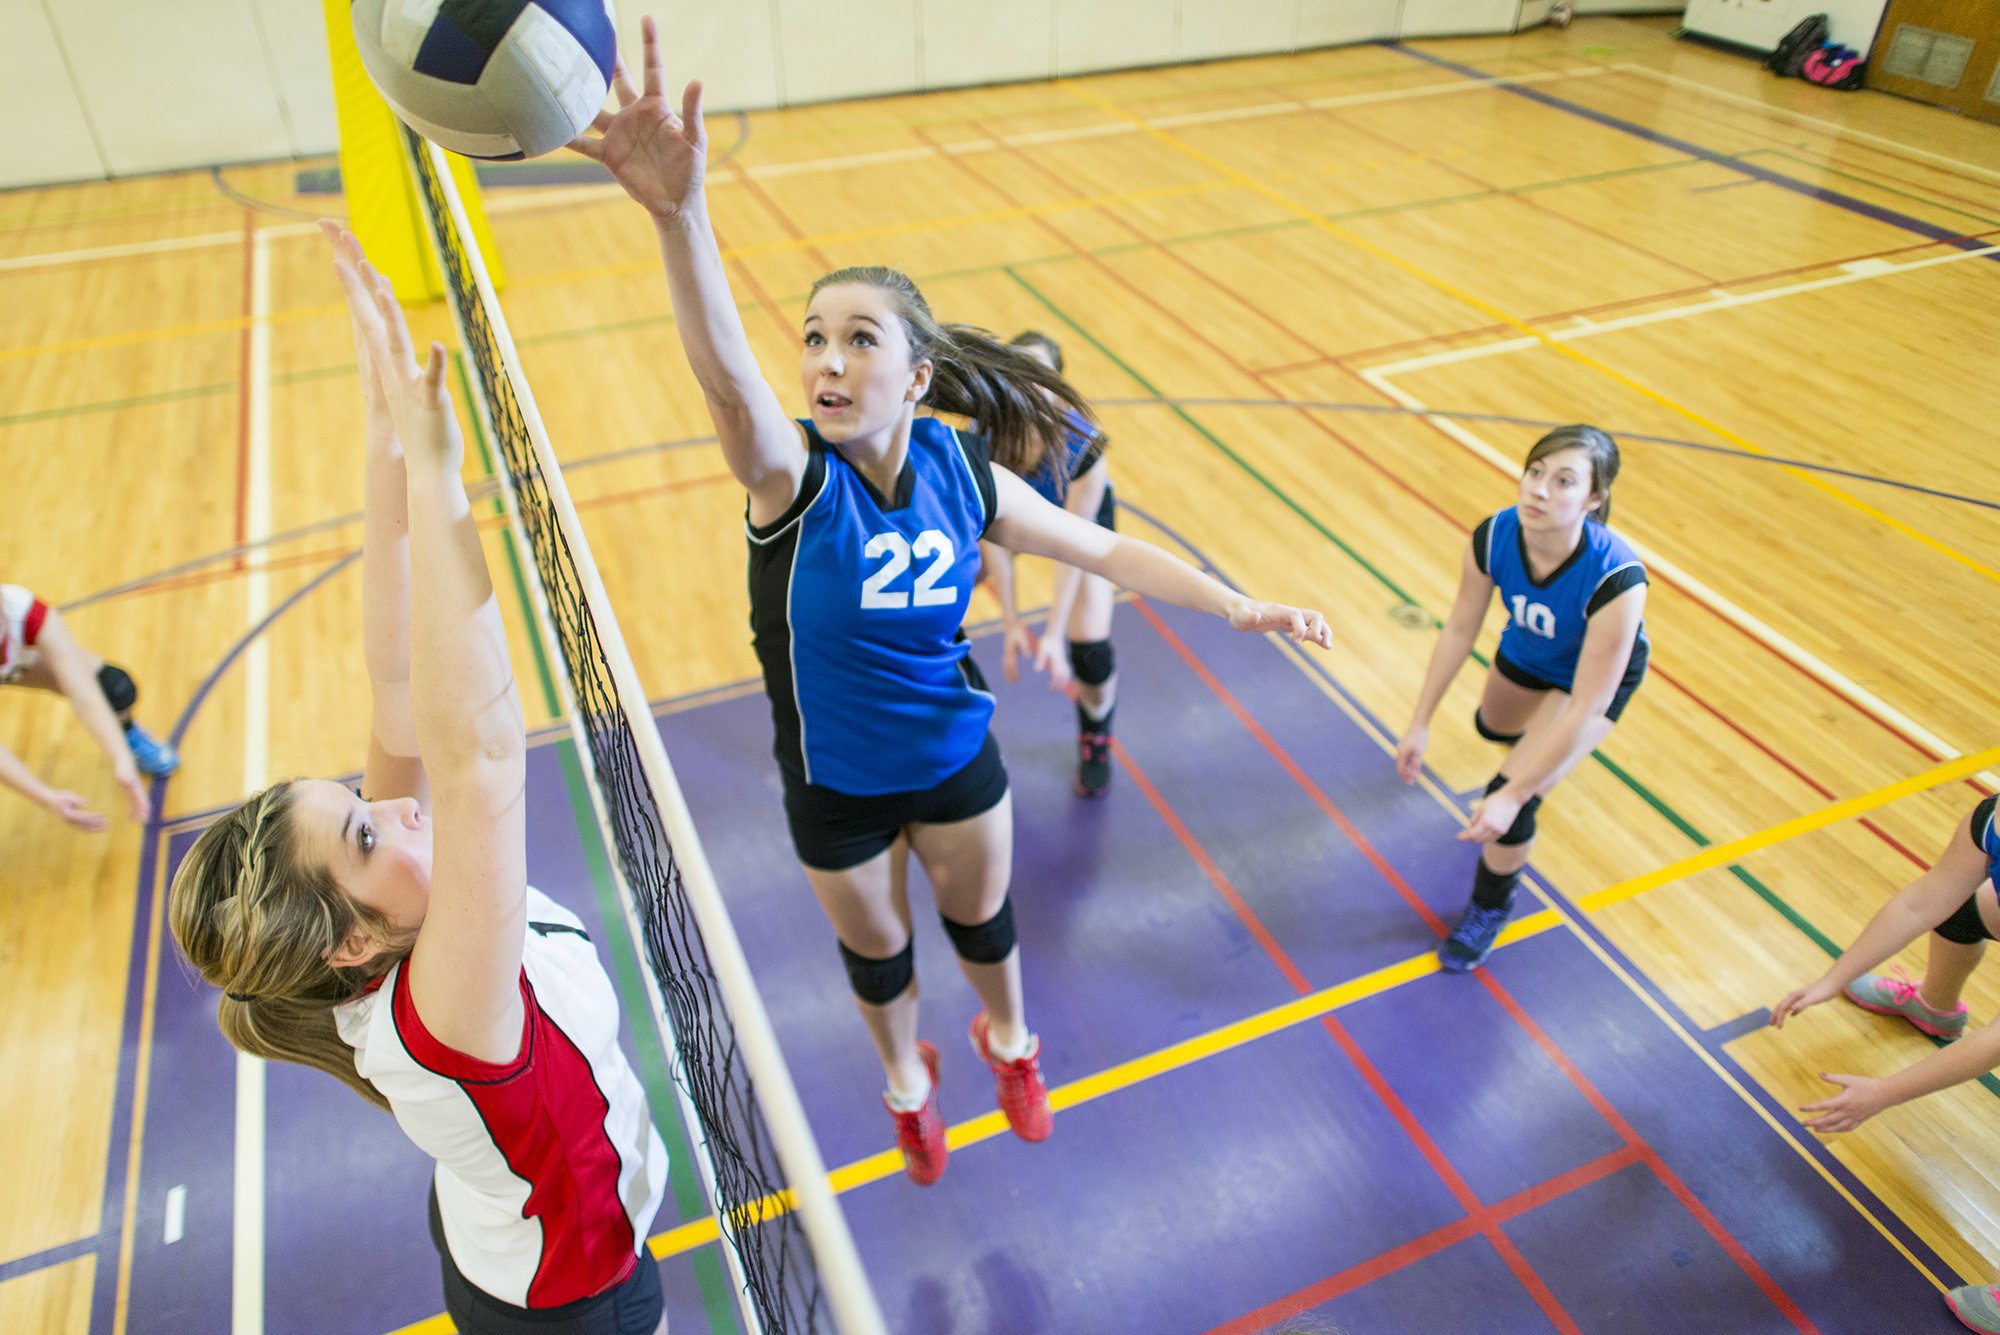 Girls highschool volleyball game.